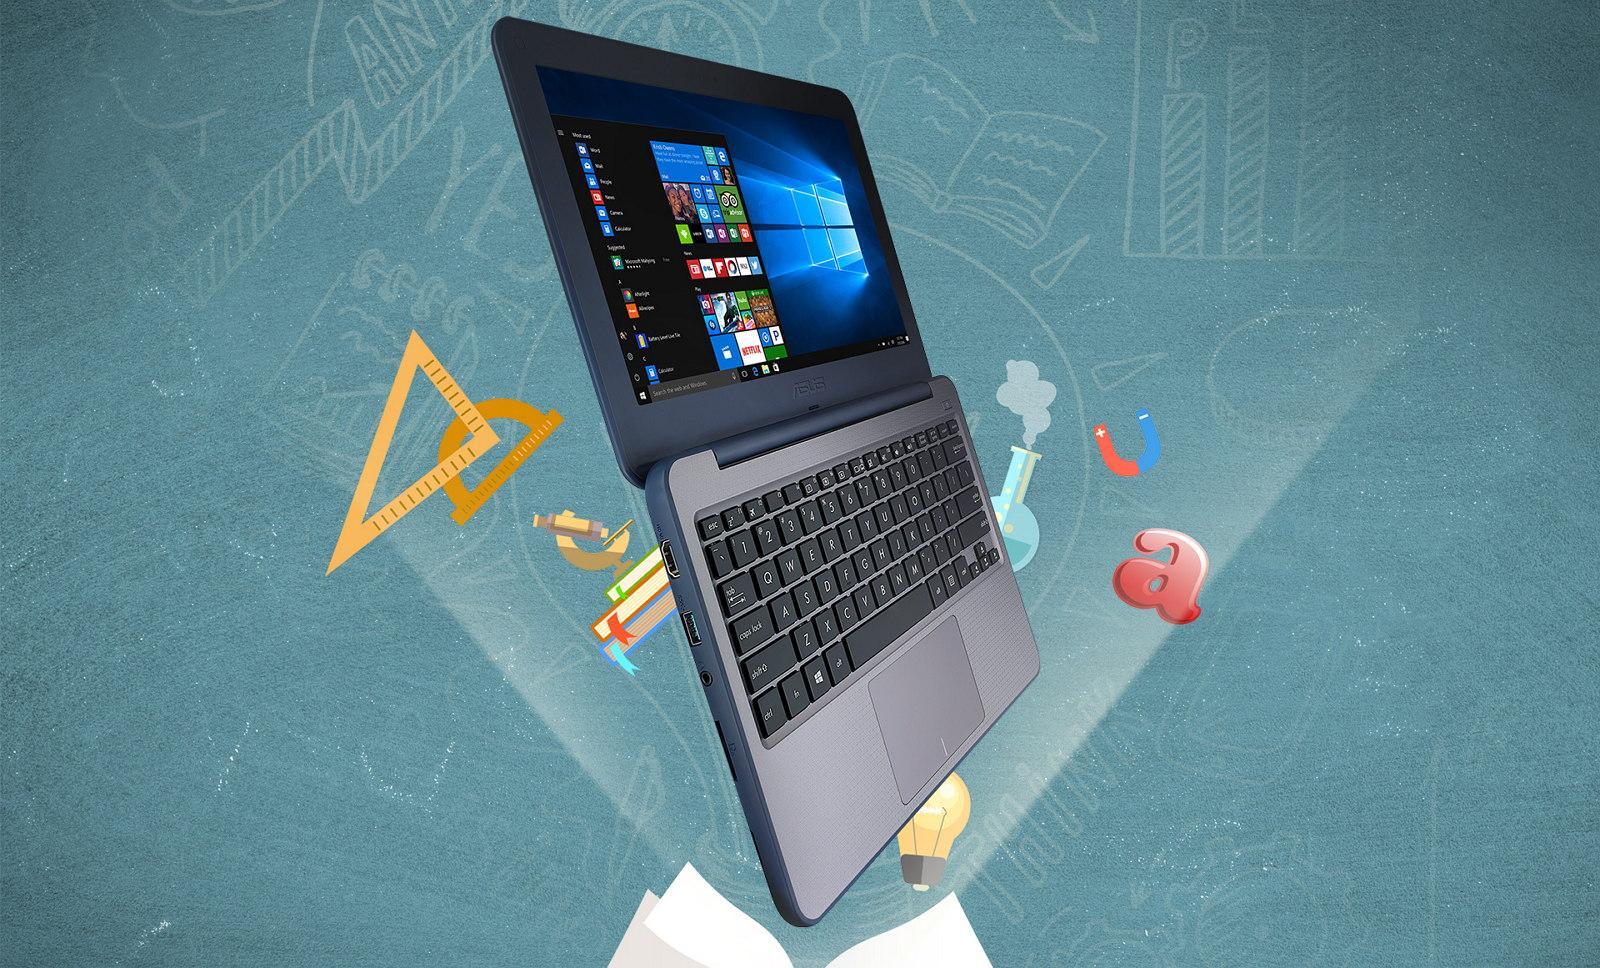 Asus VivoBook W202 running Windows 10 S